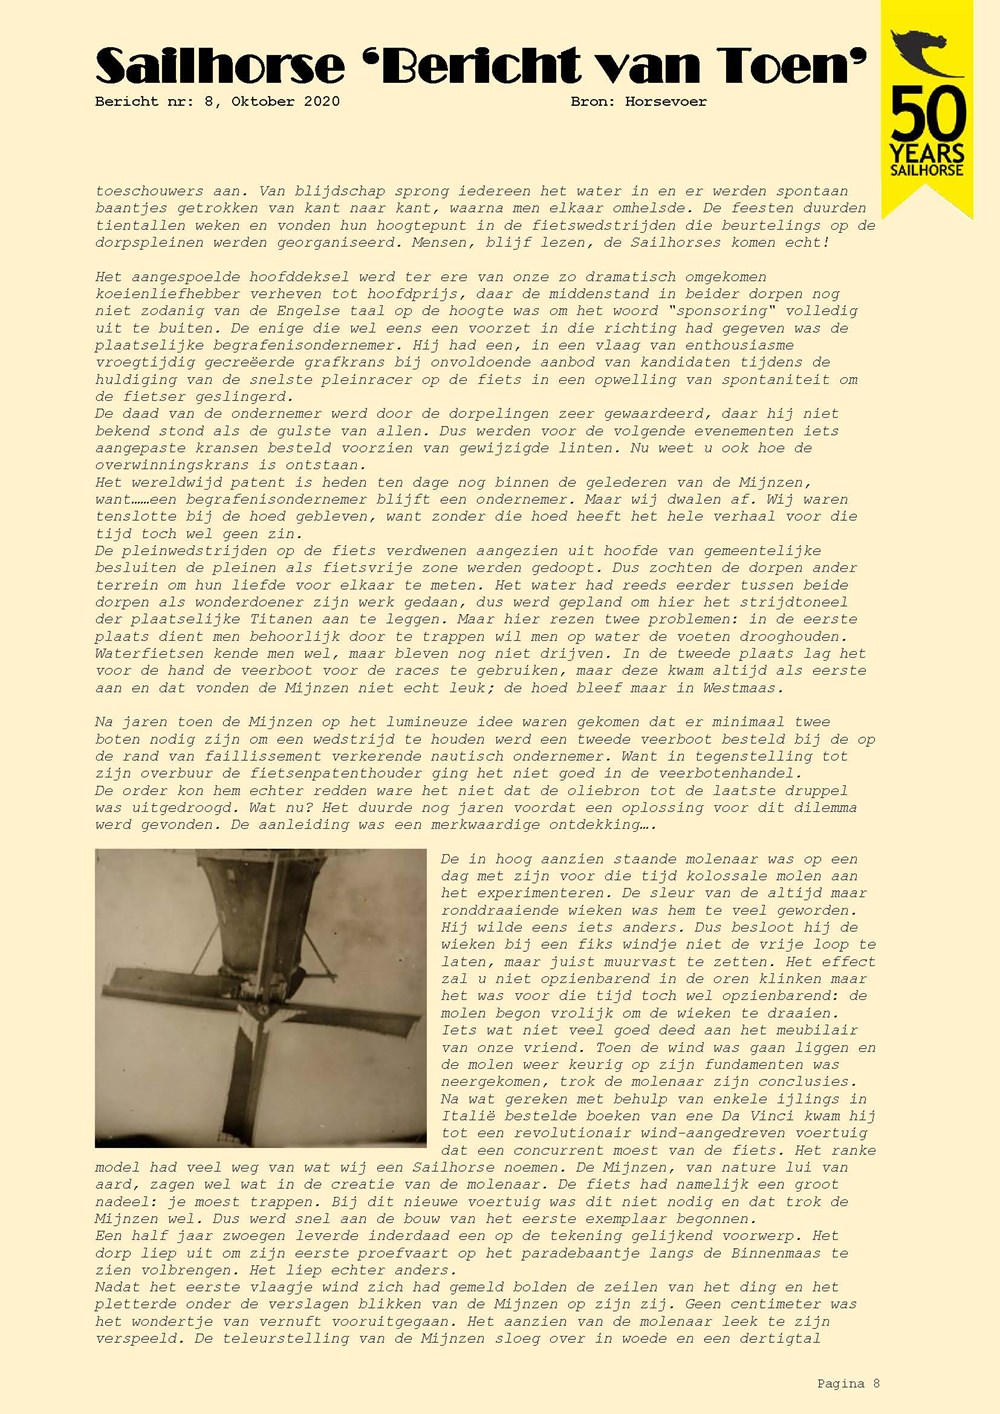 BvT8_Page_08.jpg